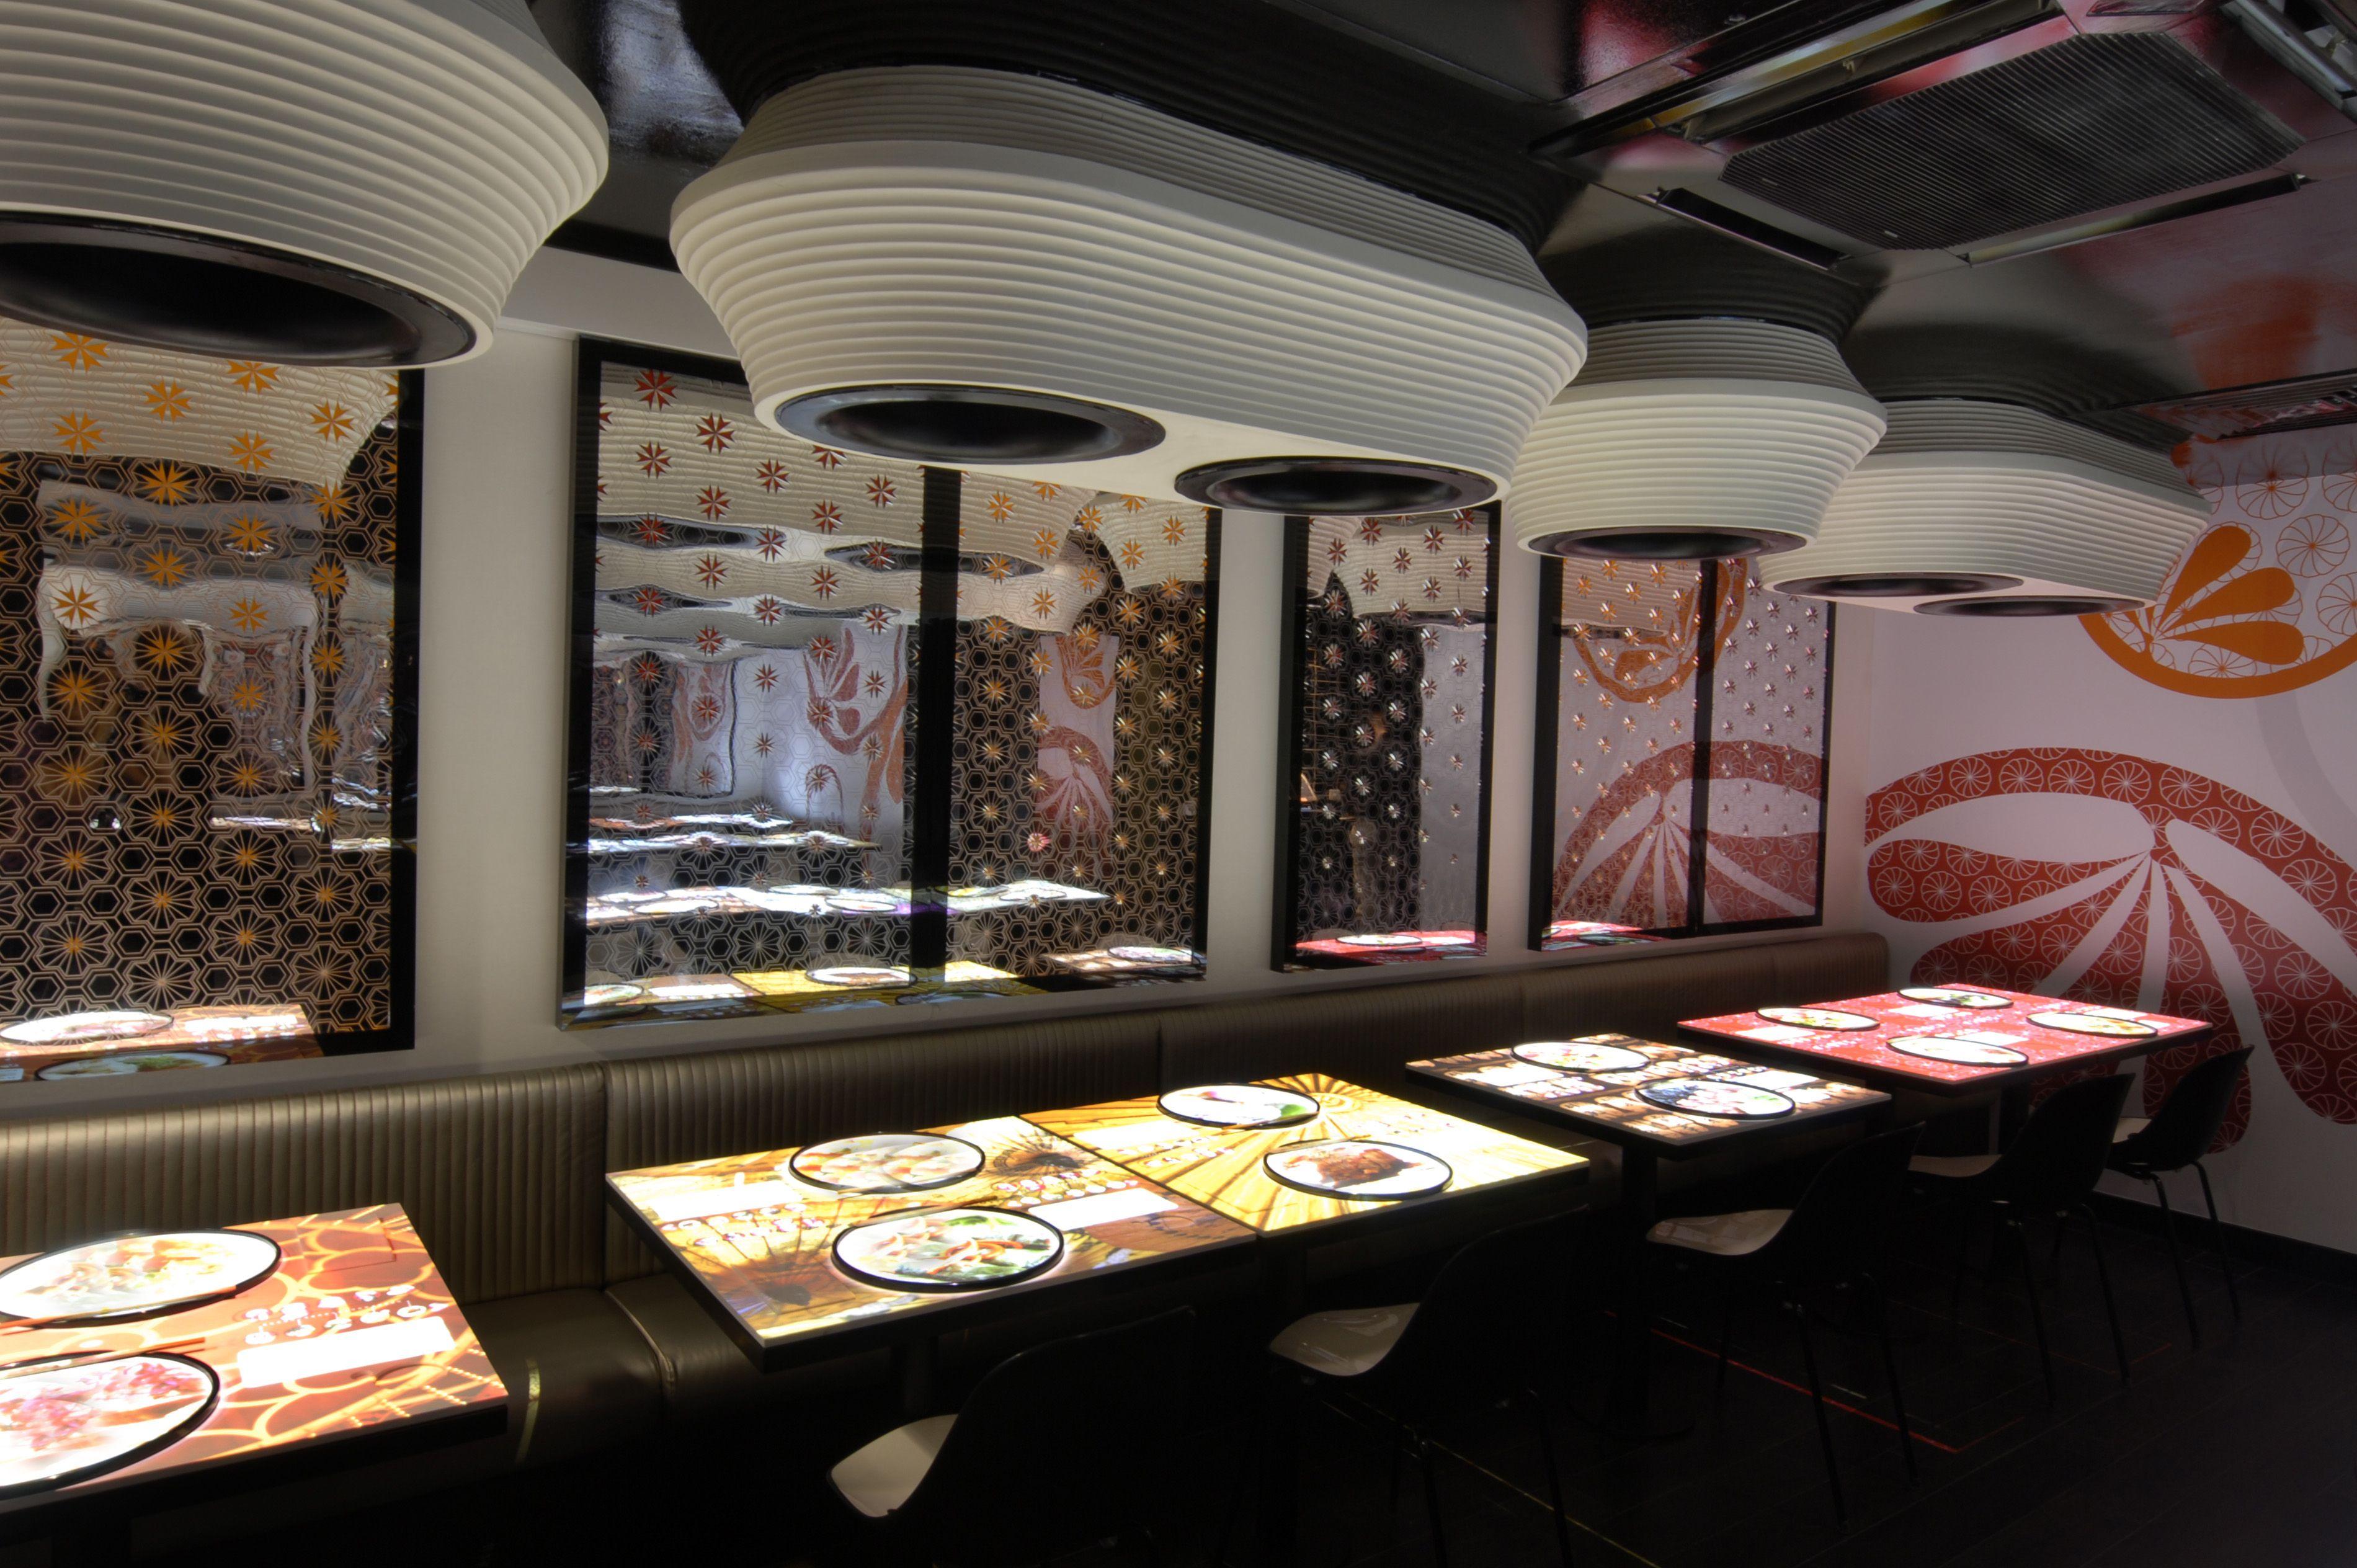 High tech restaurant design inamo london by blacksheep